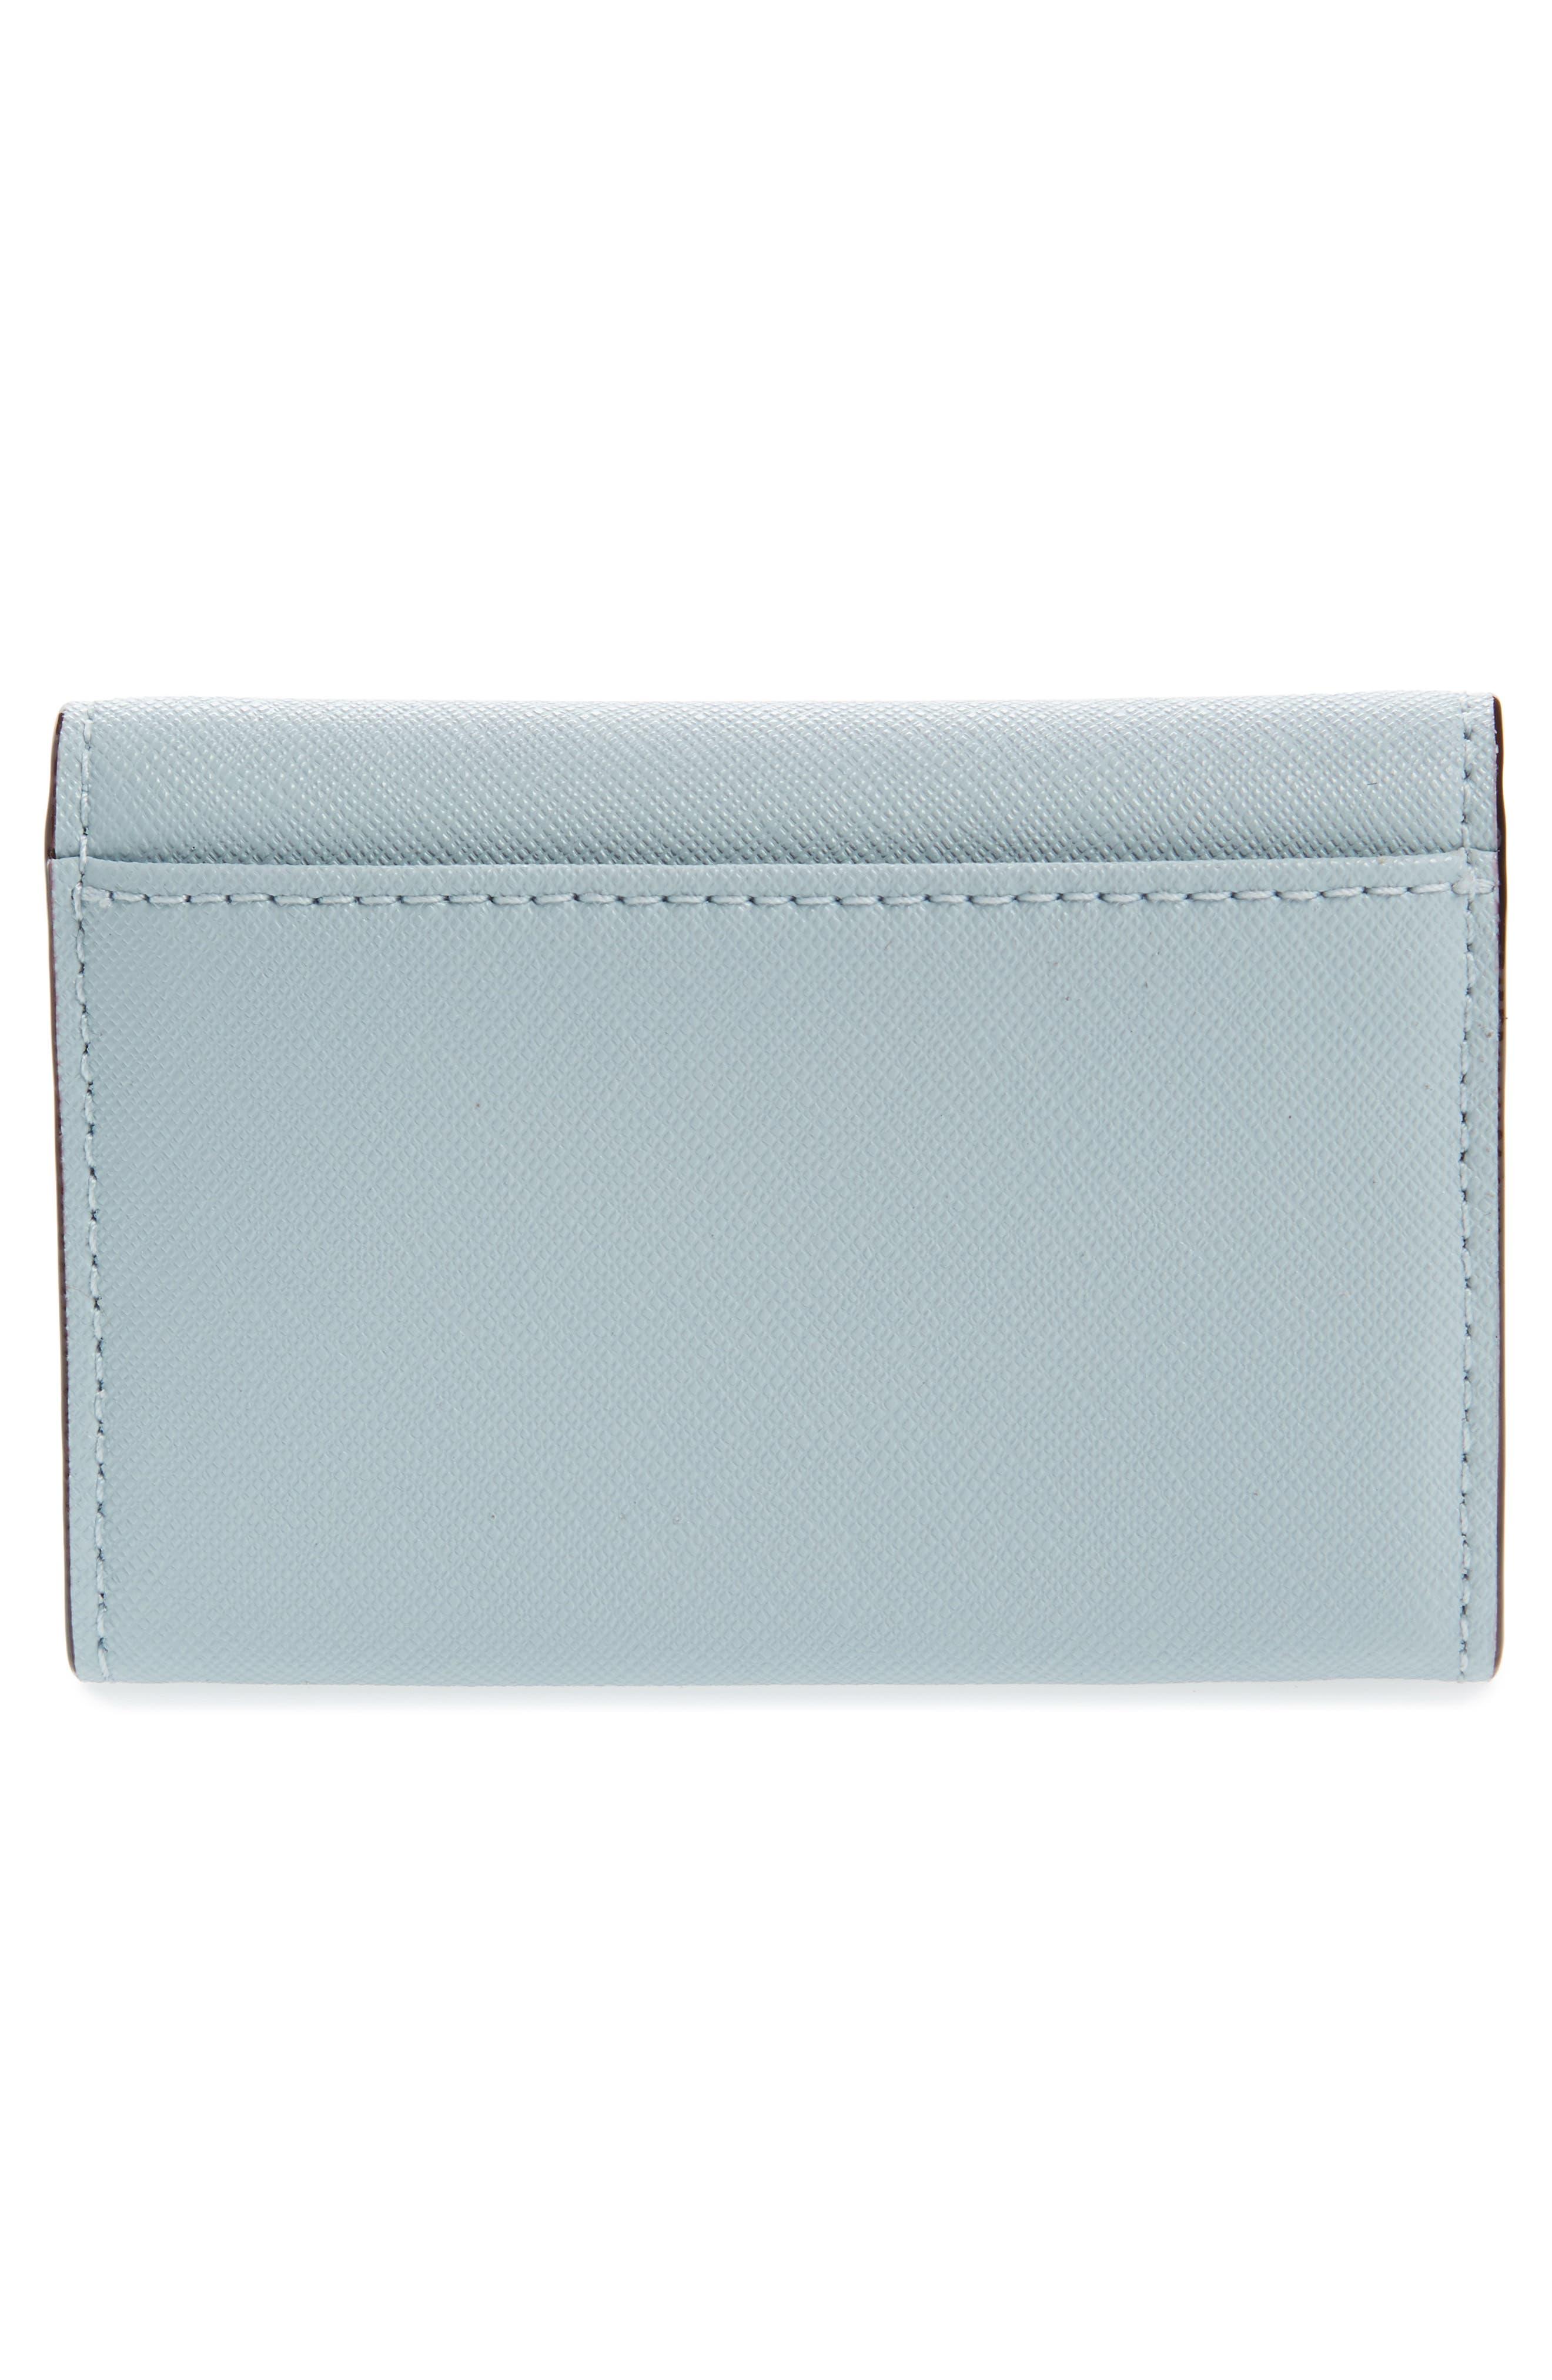 cameron street - farren leather card case,                             Alternate thumbnail 12, color,